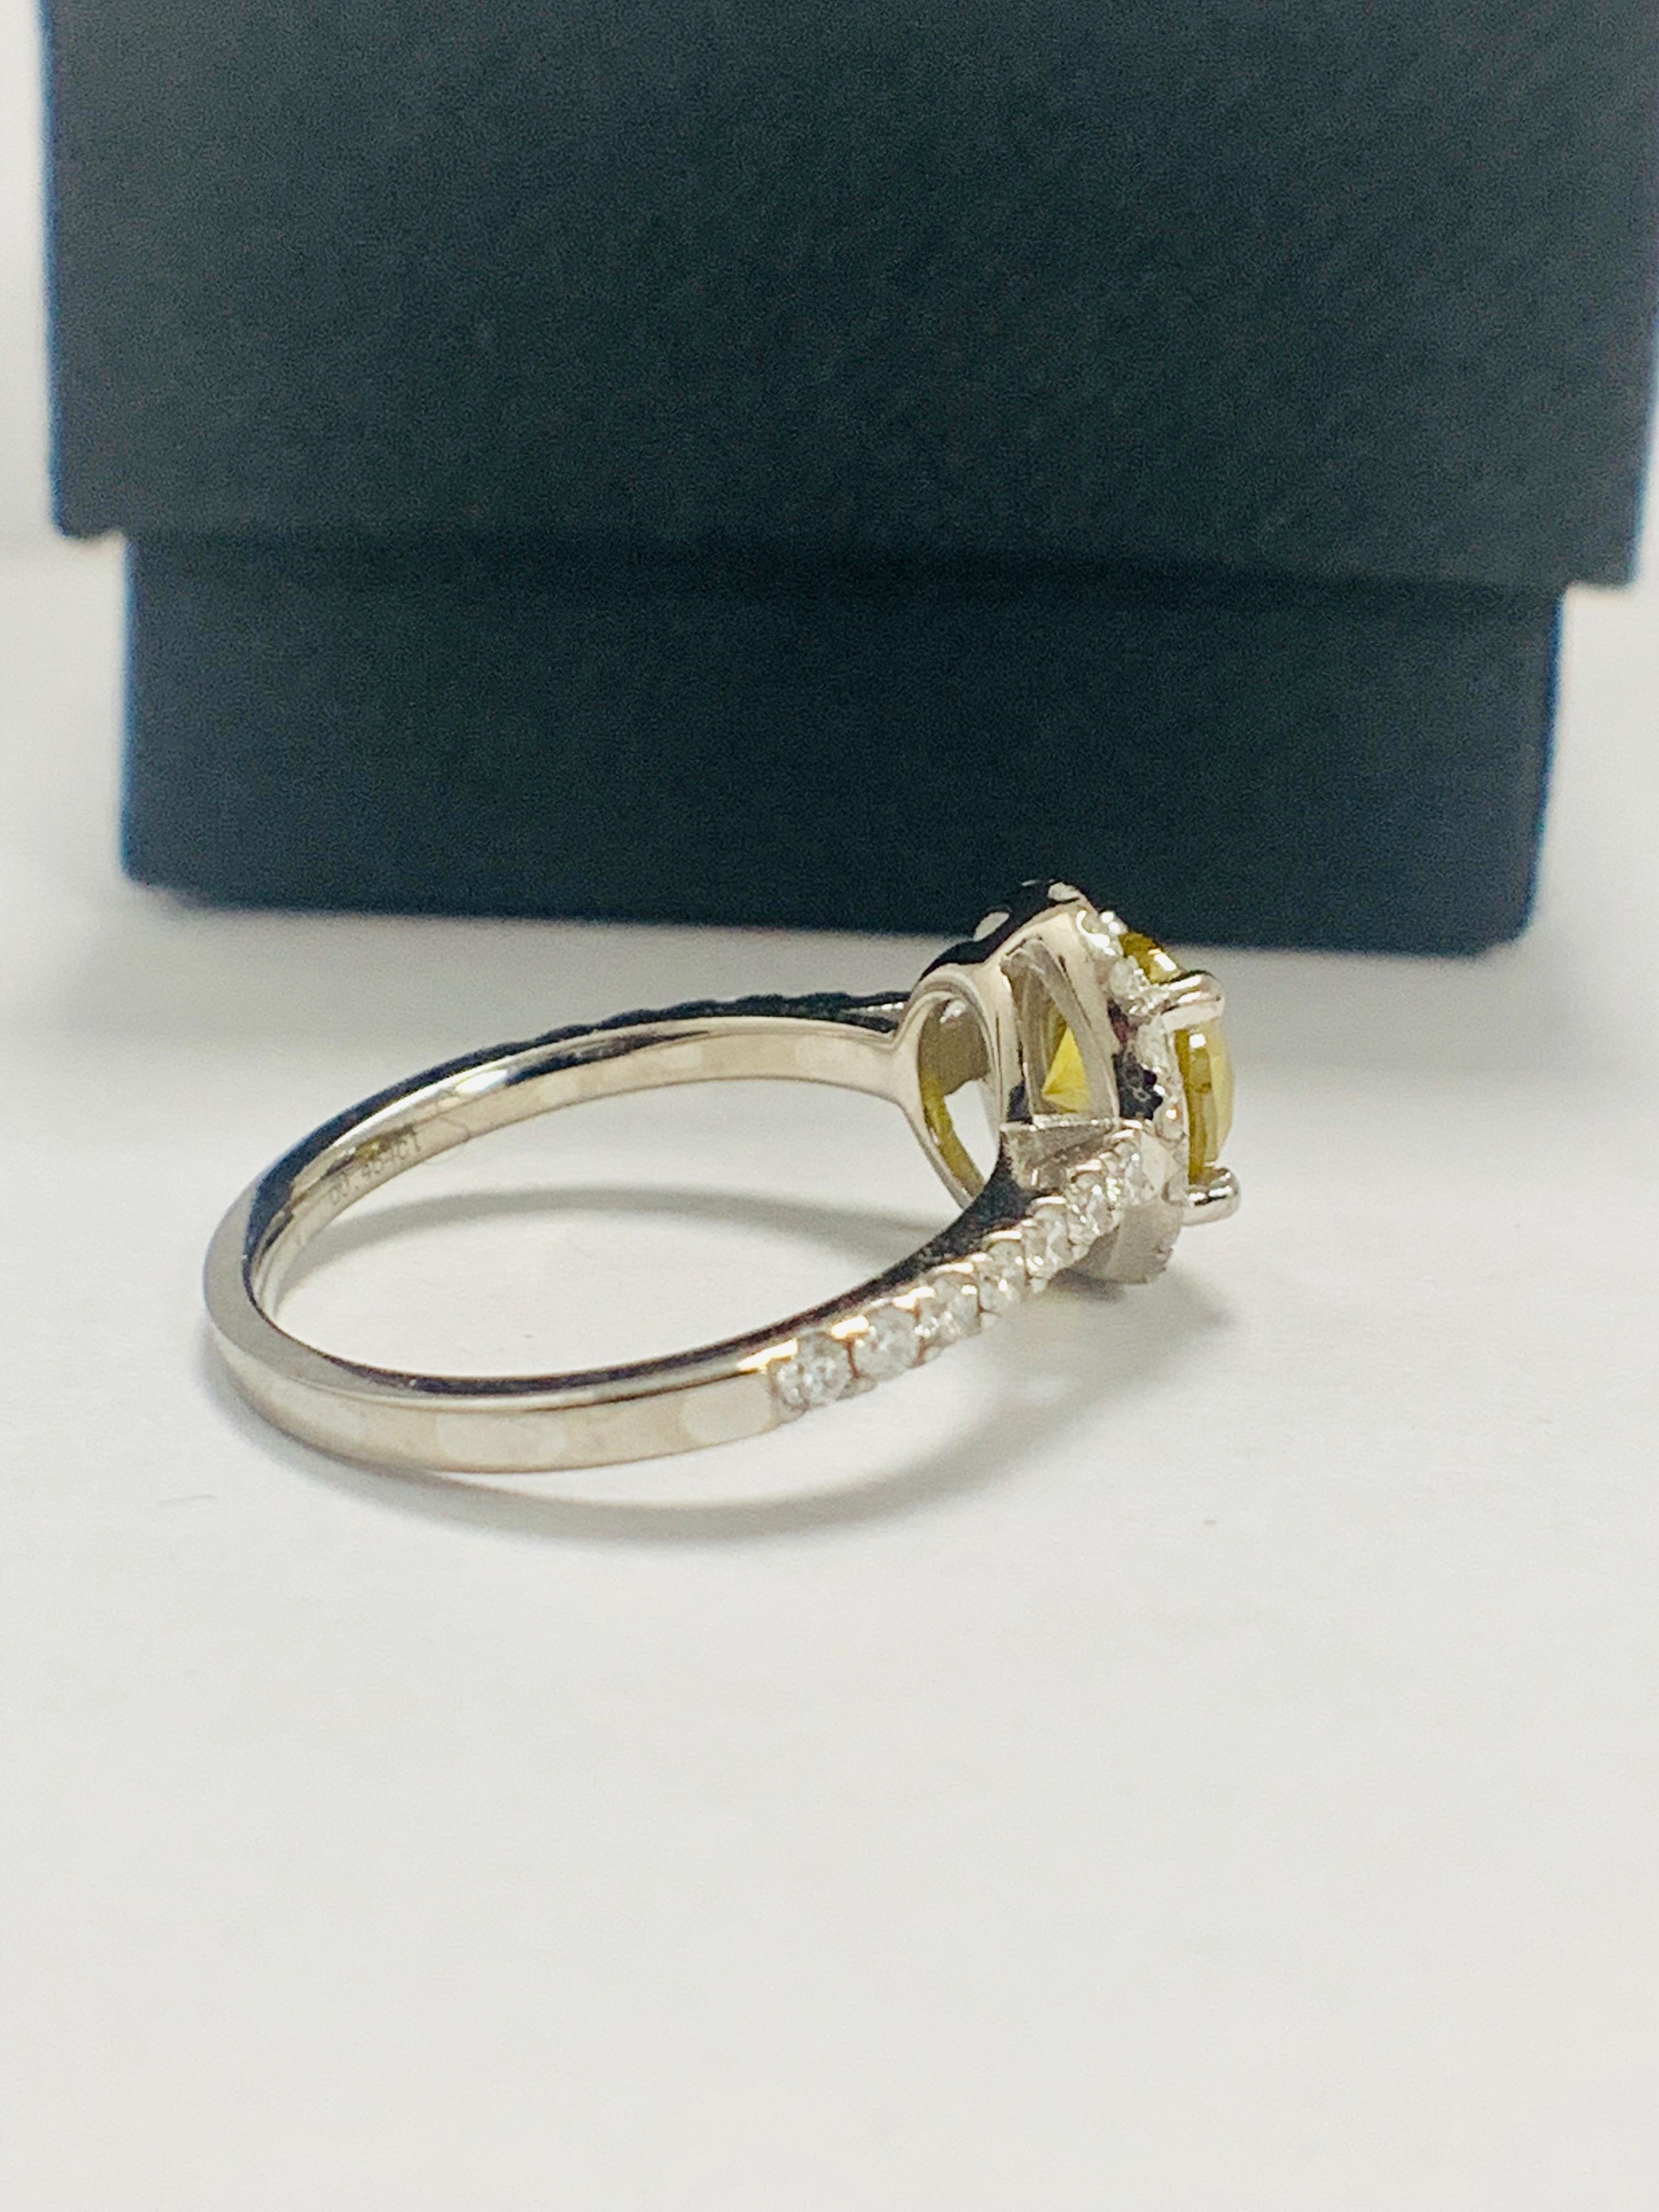 14ct White Gold Diamond ring featuring centre, round brilliant cut, yellow Diamond (1.08ct) - Image 7 of 12